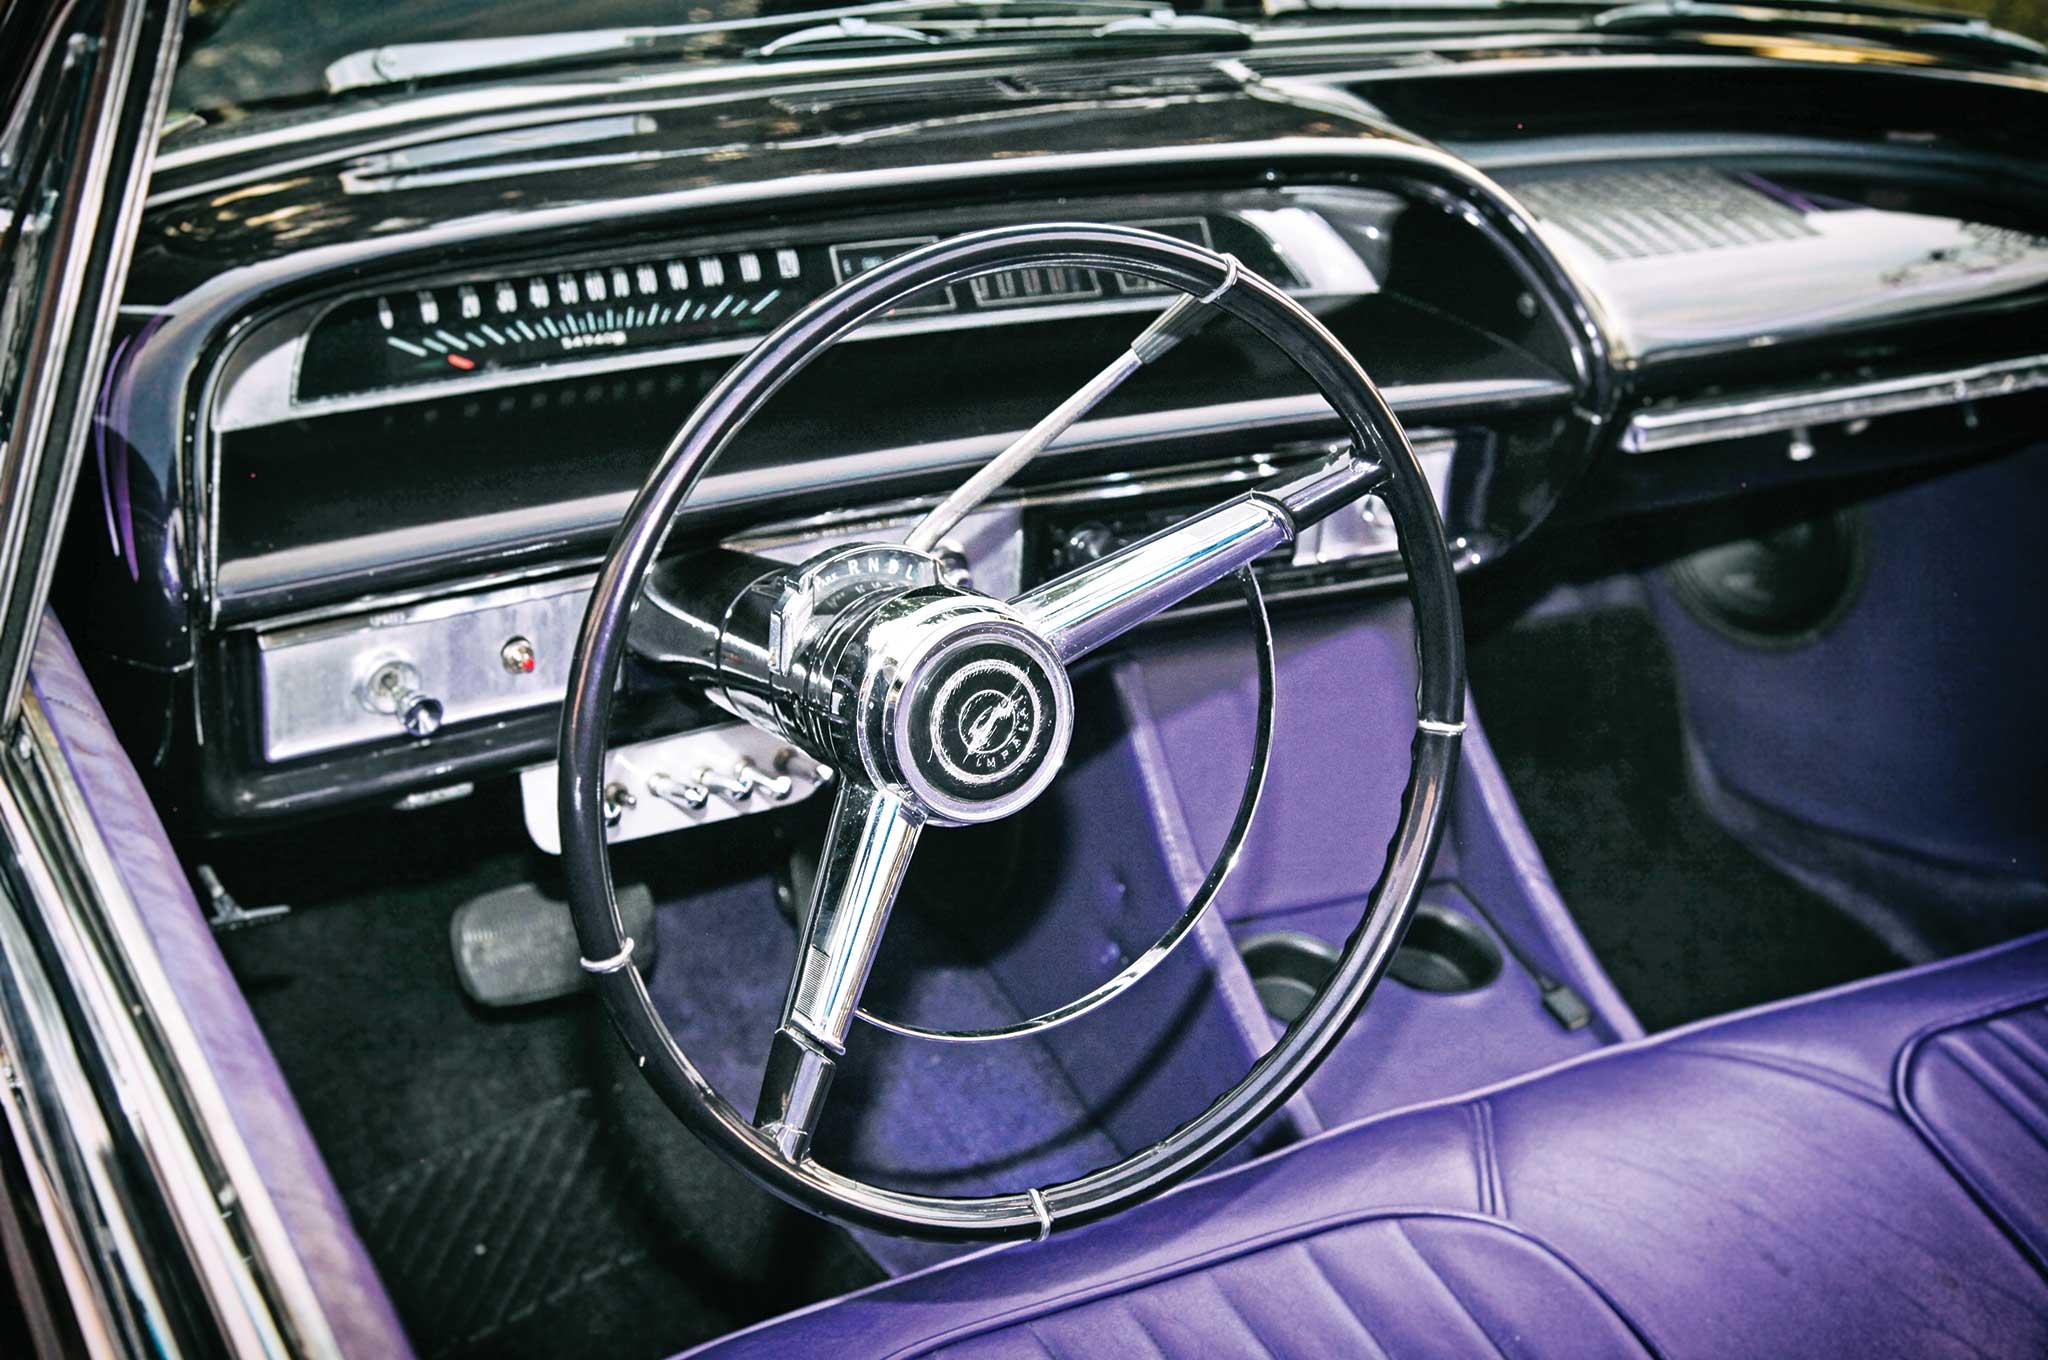 1964 Chevrolet Impala Mechanical Influence Lowrider